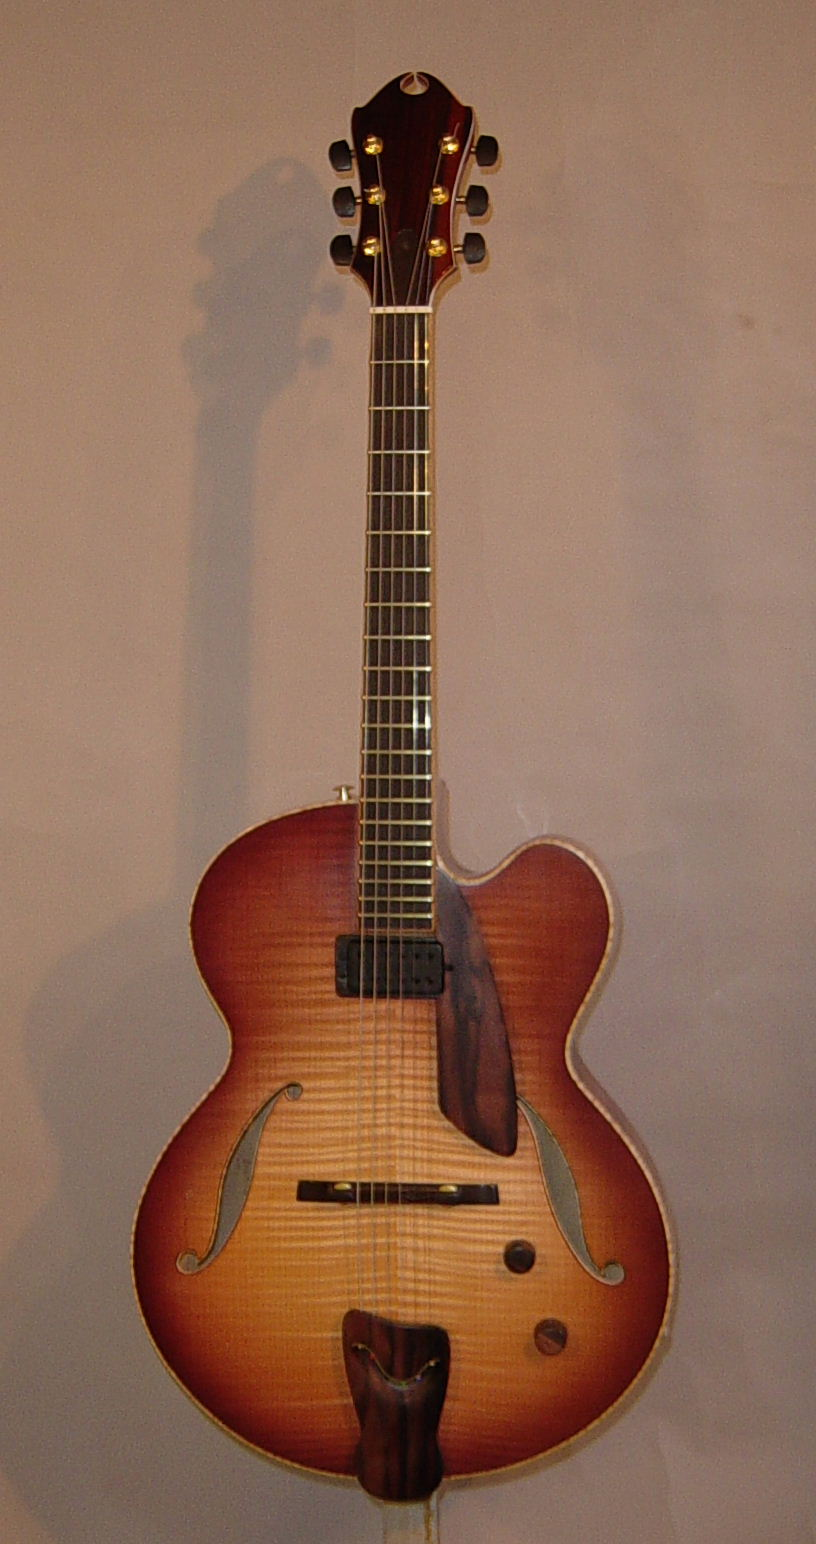 borys_guitars_8f08c9d8_152515.jpg